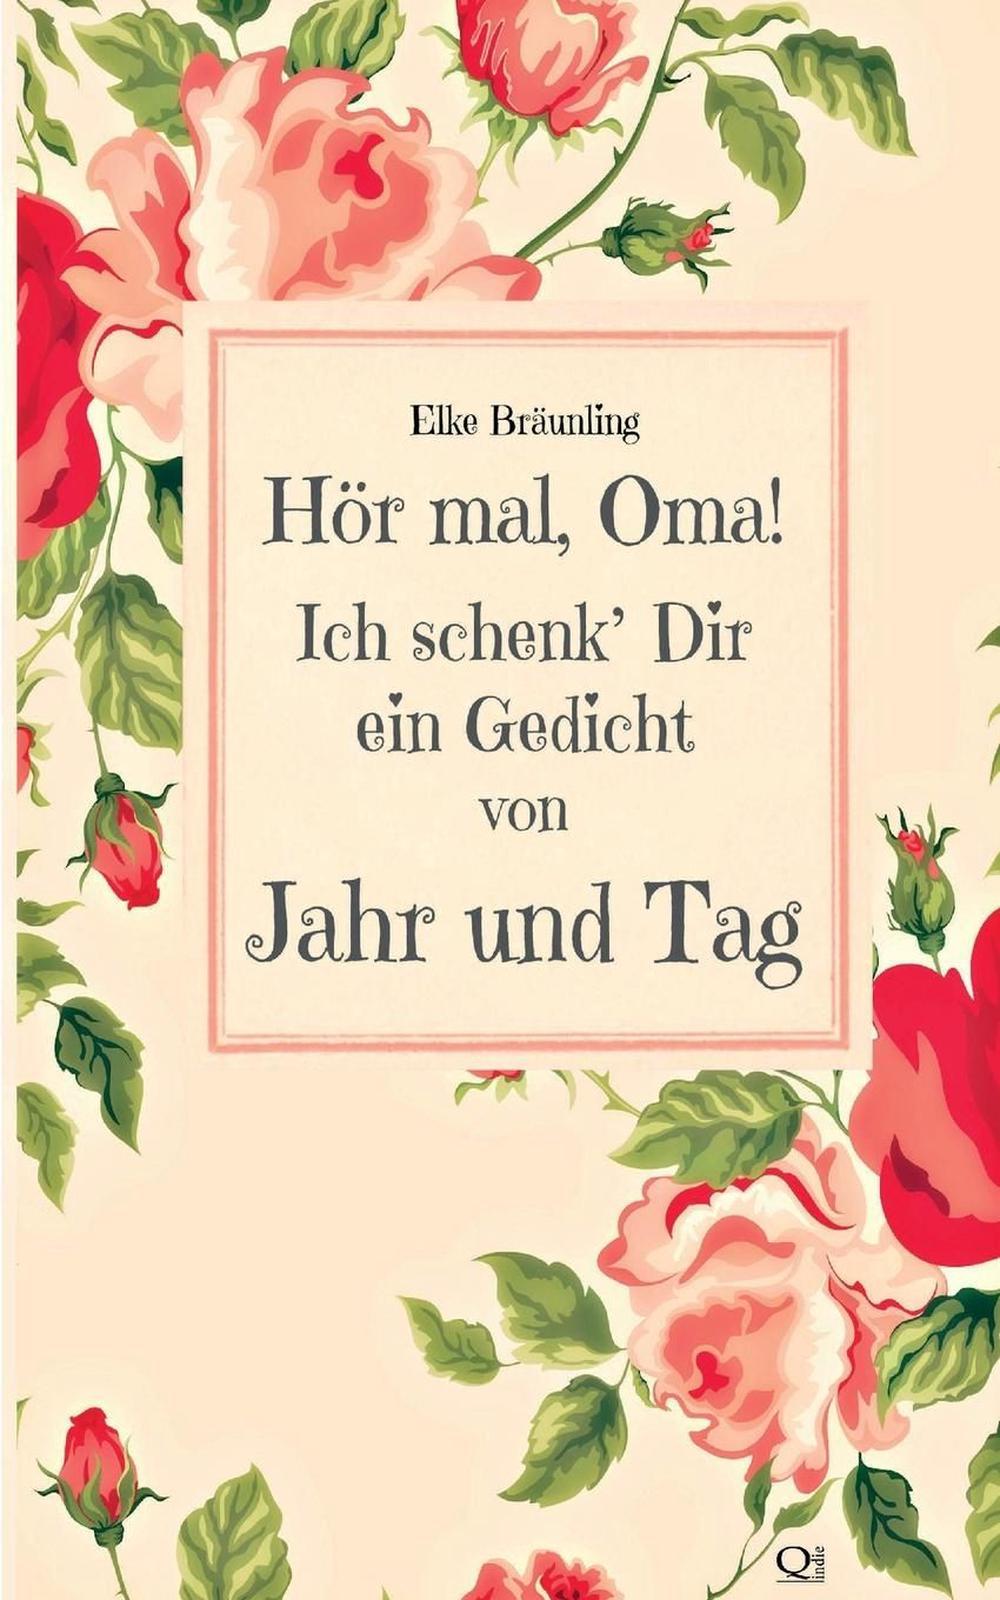 Oma Gedichtjes Opa Gedichten En Oma Gedichten 2020 02 21